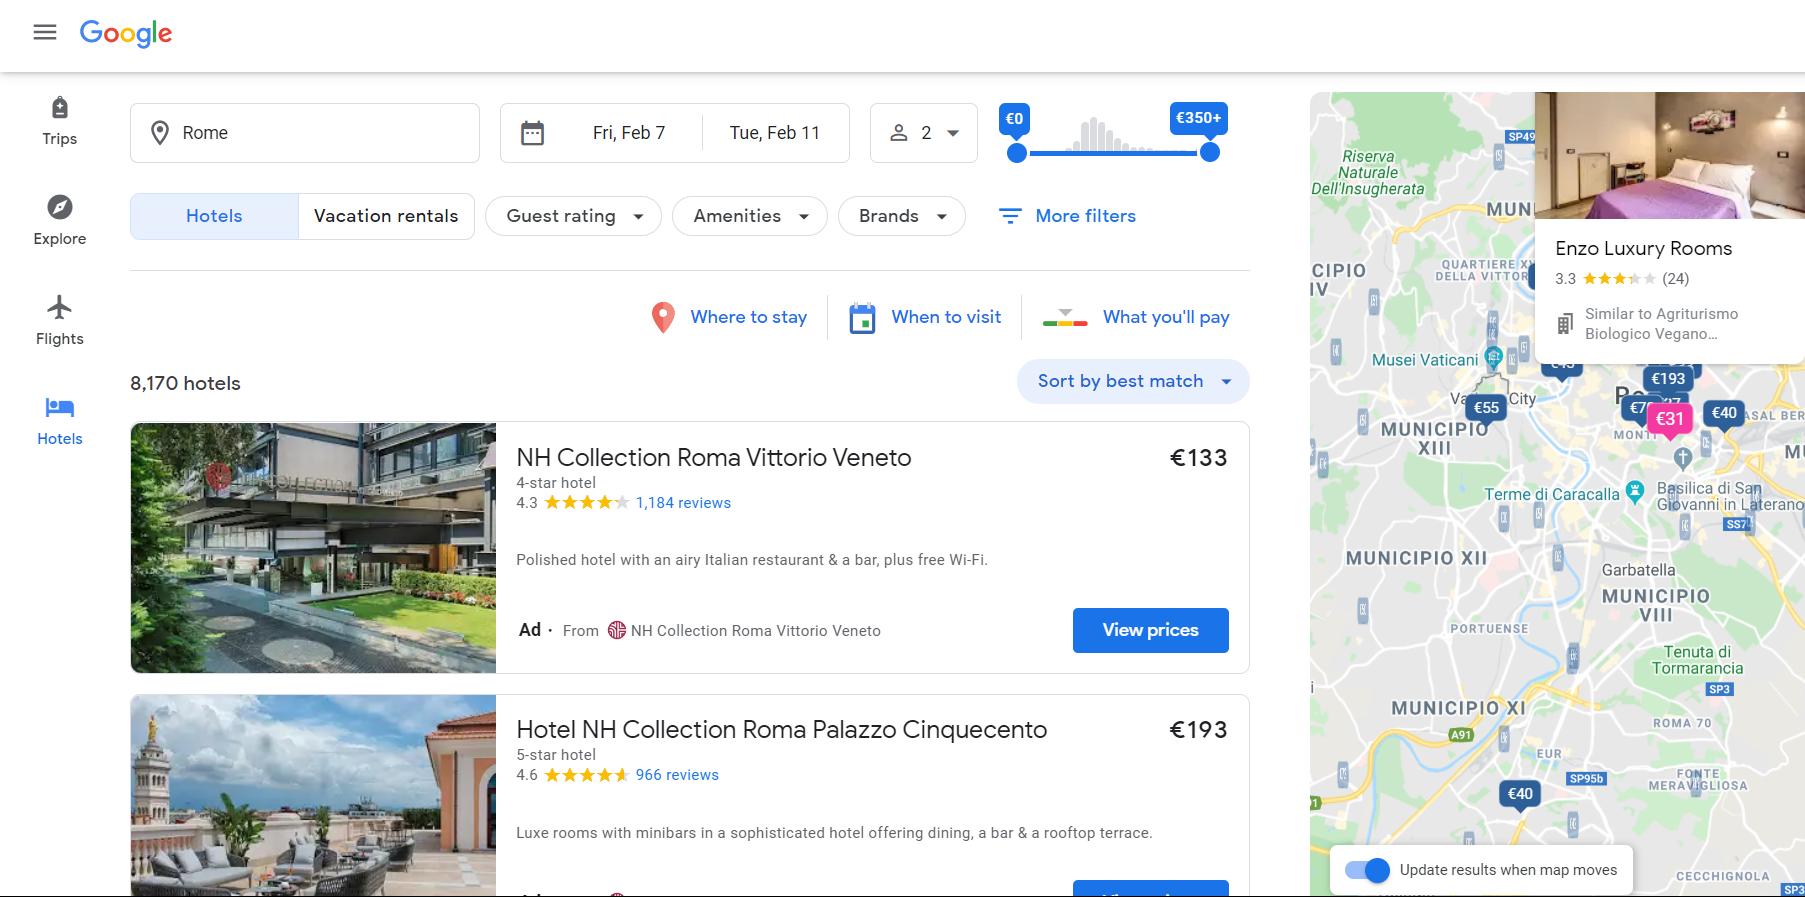 google travel_opportunità_hotel manager e albergatori (8)_hotel